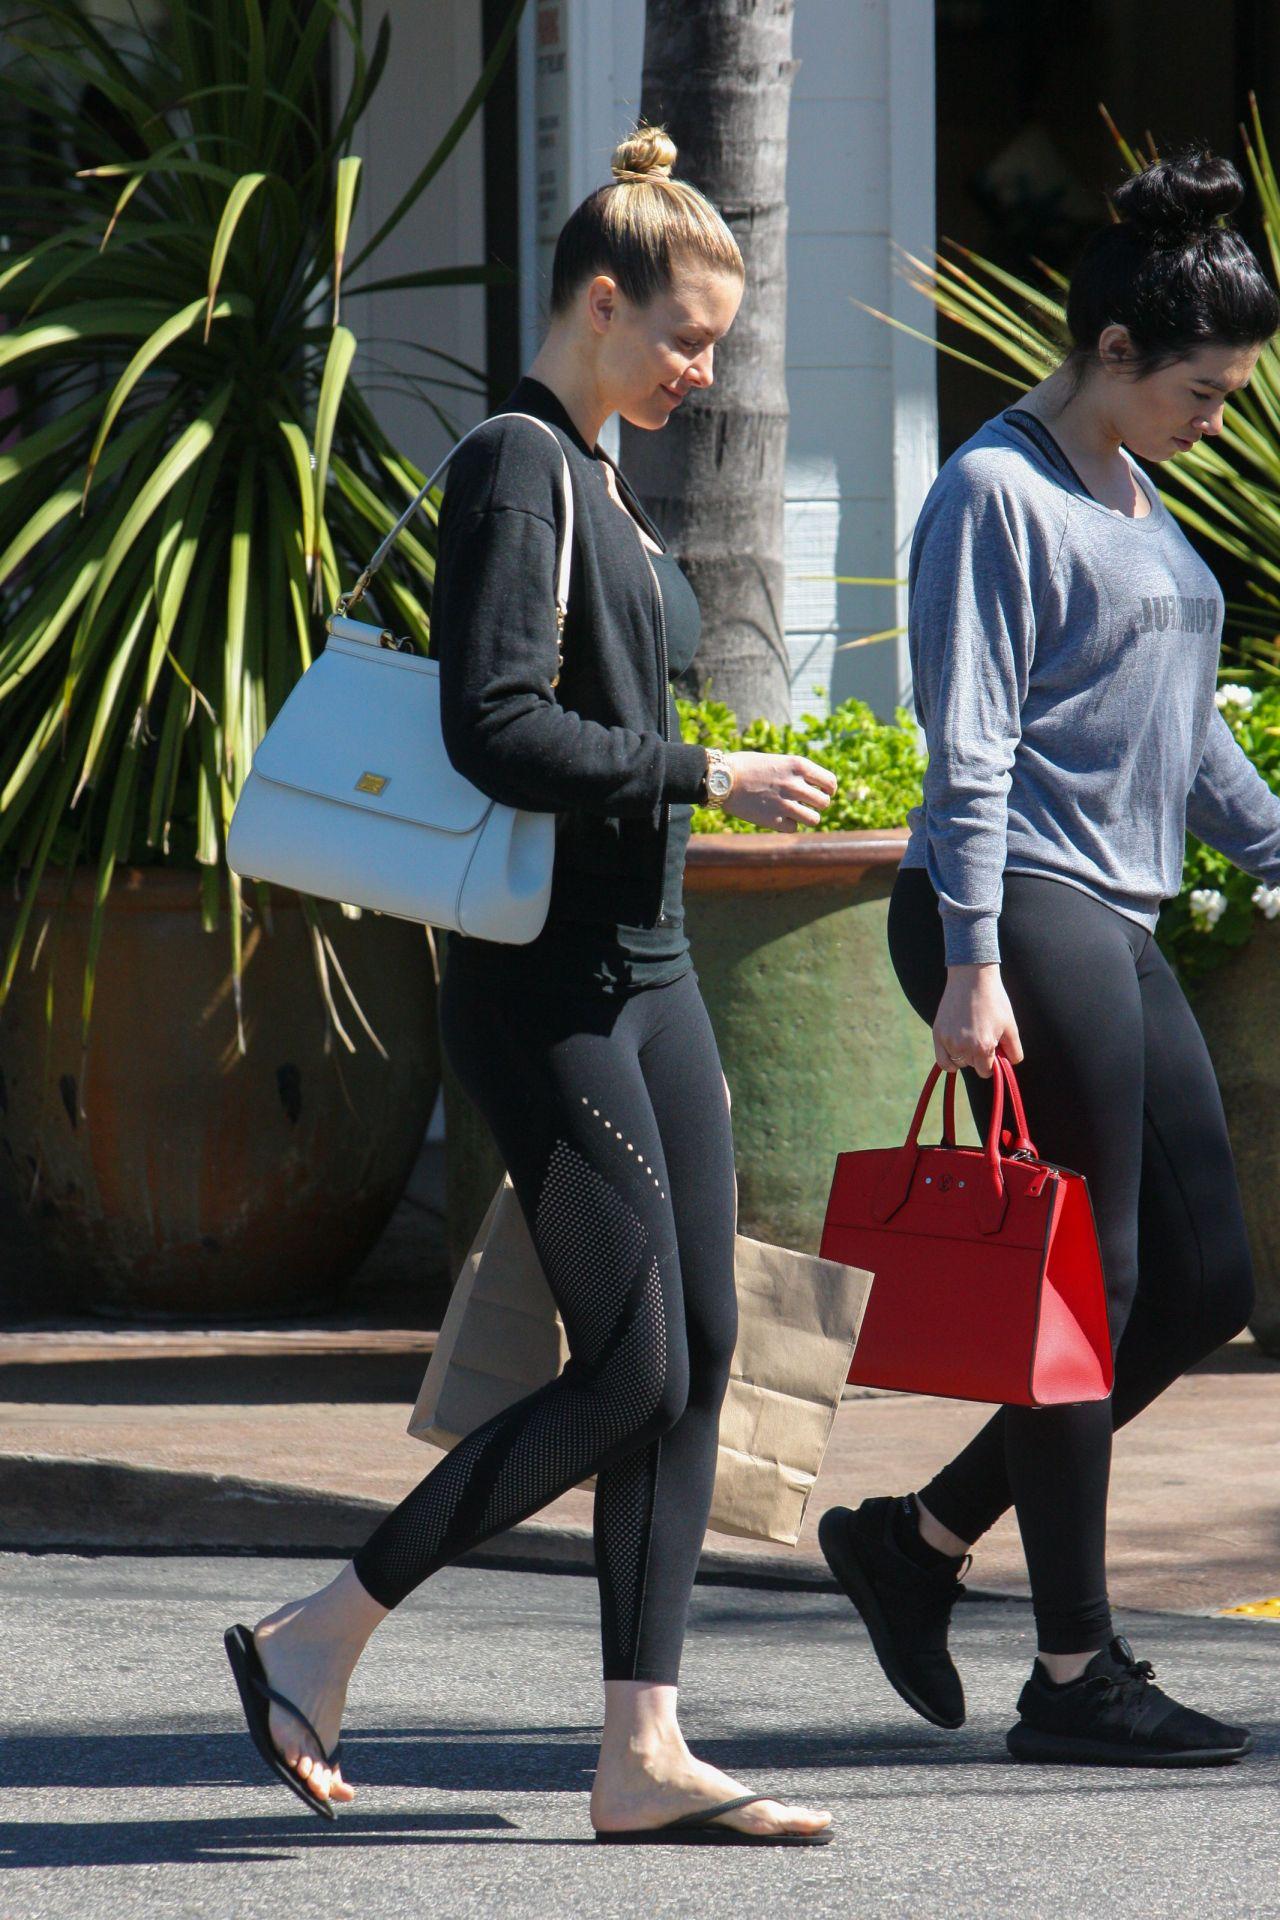 Olya ivanisevic,Camille rowe victorias secret swimwear 2014 hq photo shoot Erotic photos Britney spears stockings,Sexy Photos of Bruna Tuna. 2018-2019 celebrityes photos leaks!